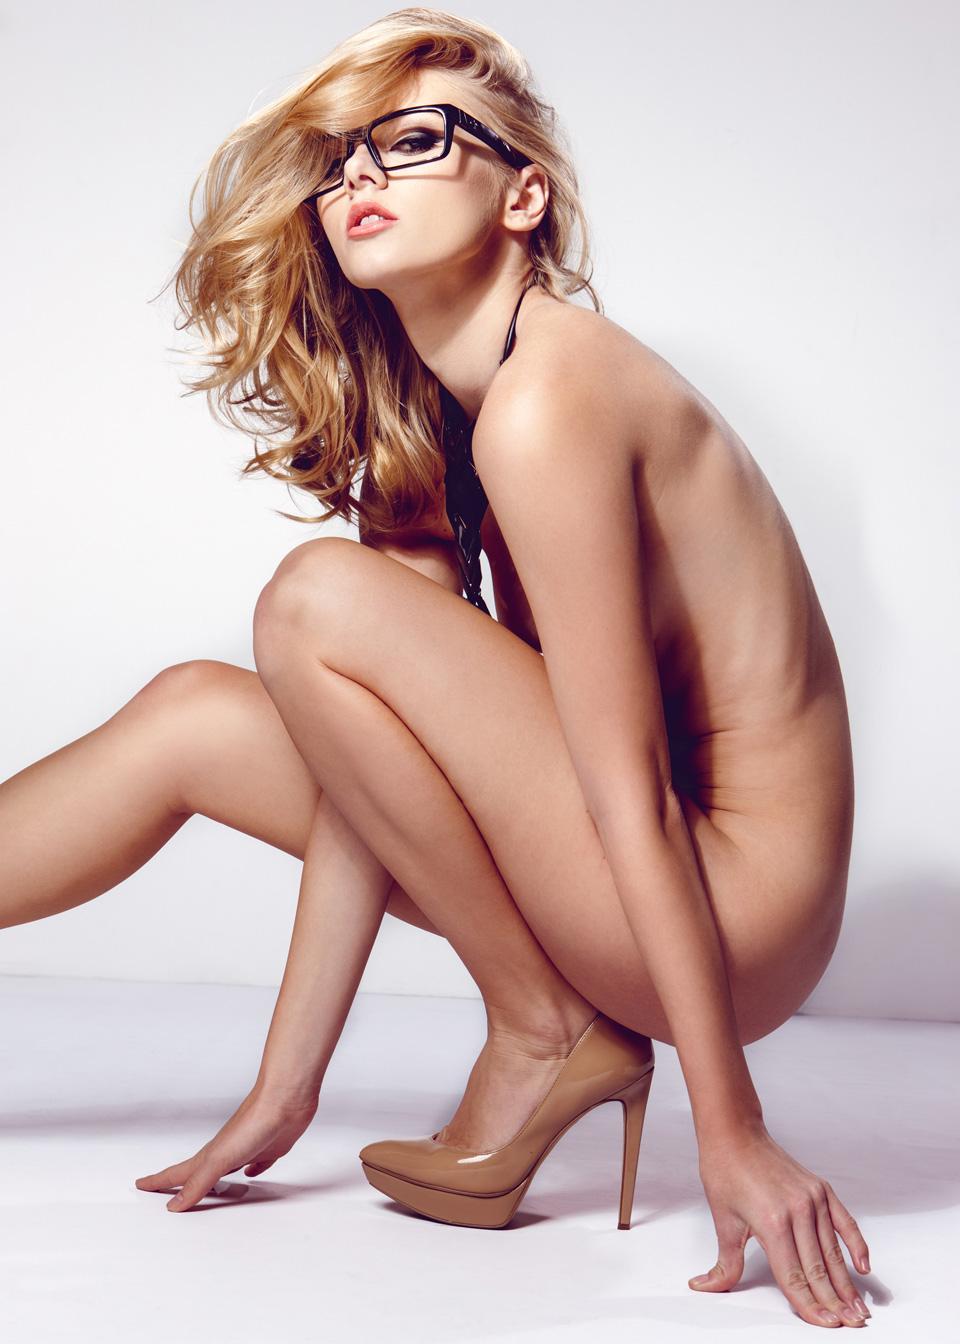 Nude pump